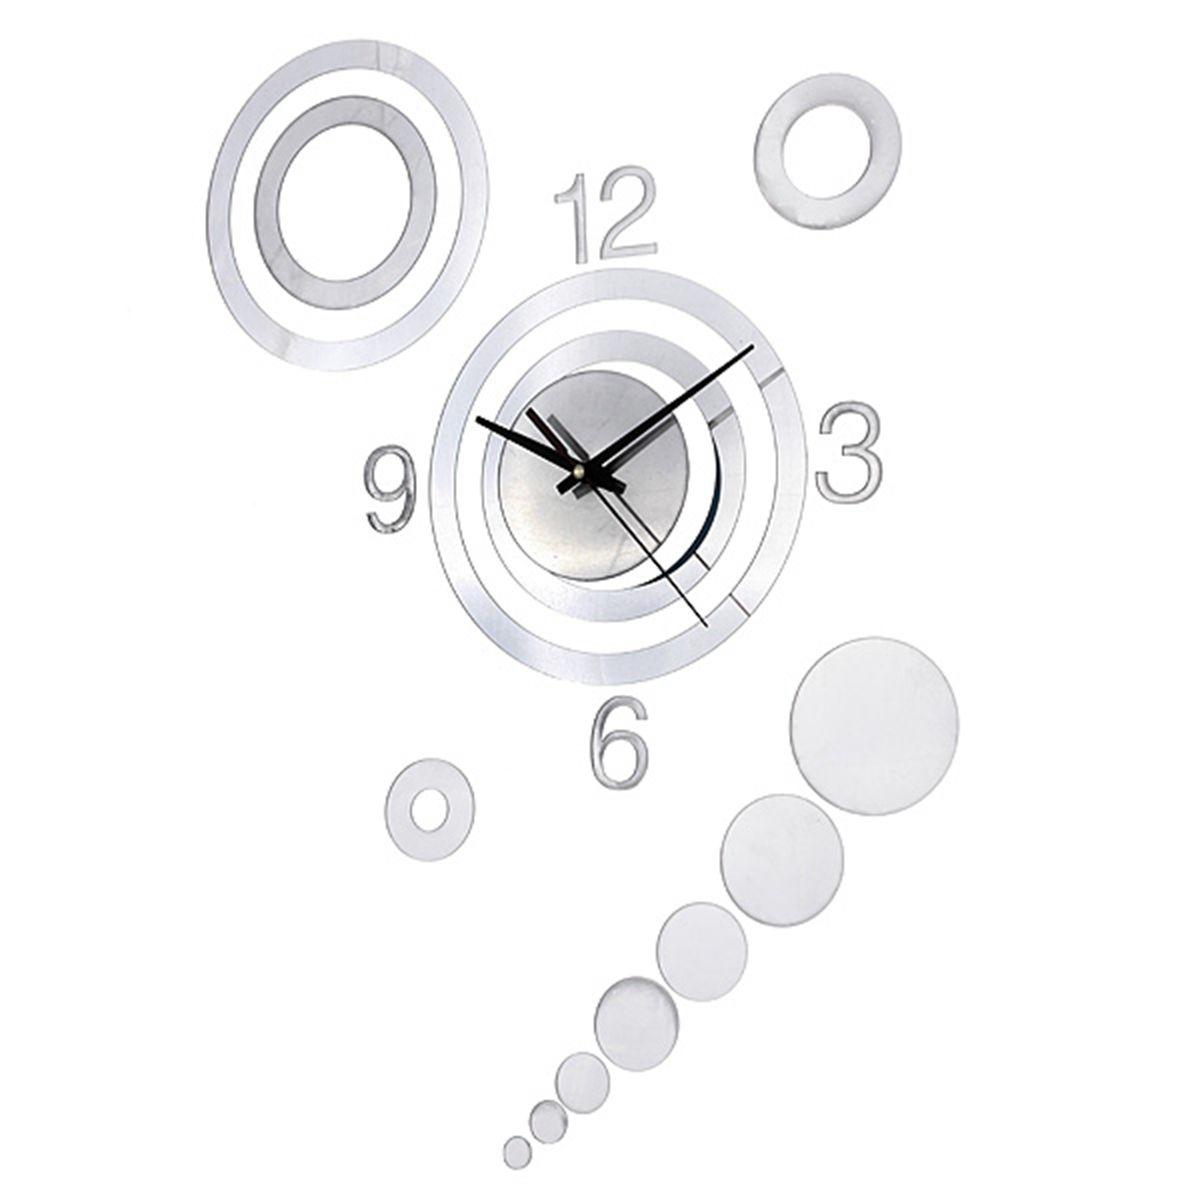 horloge murale engrenage noire 71 x 51 cm